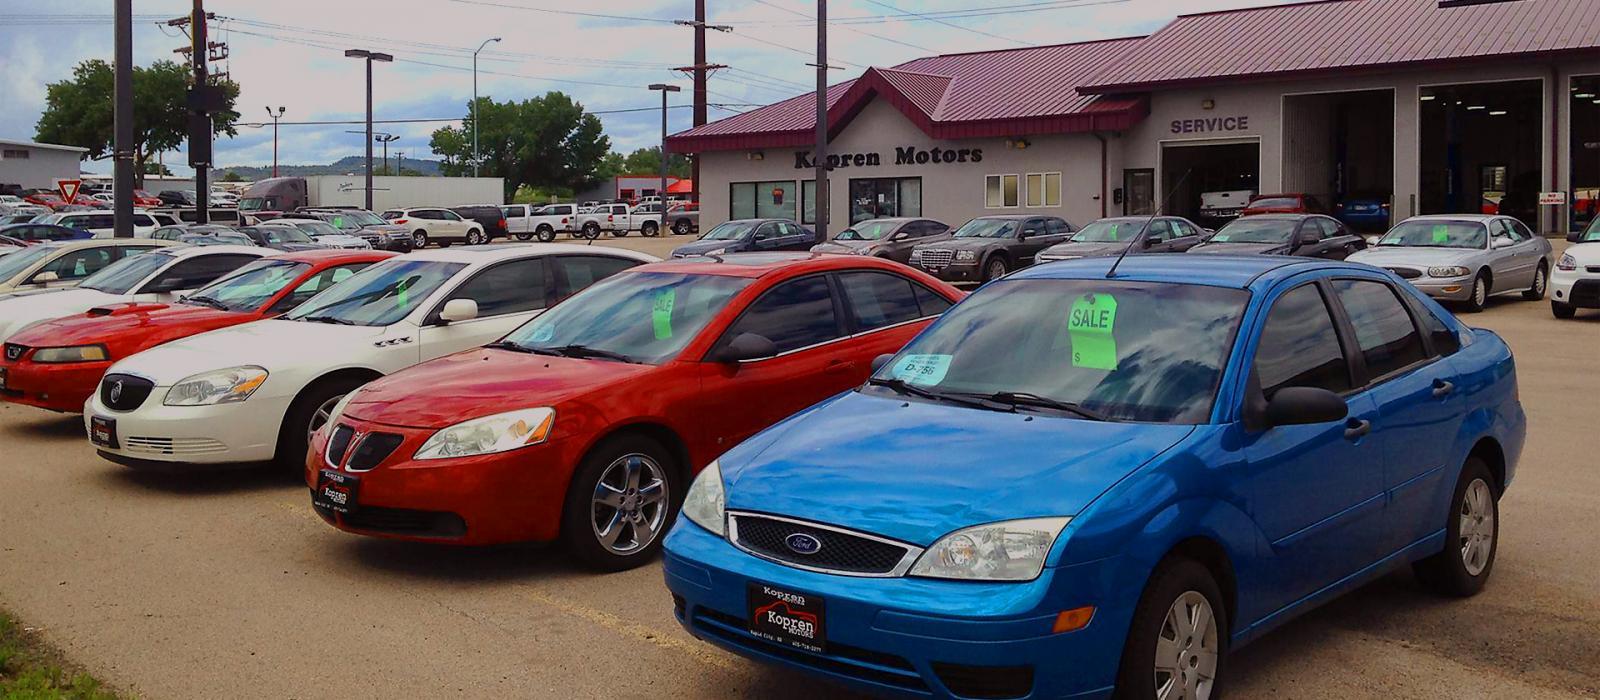 Kopren motors used cars rapid city sd used cars rapid for Wheel city motors rapid city south dakota